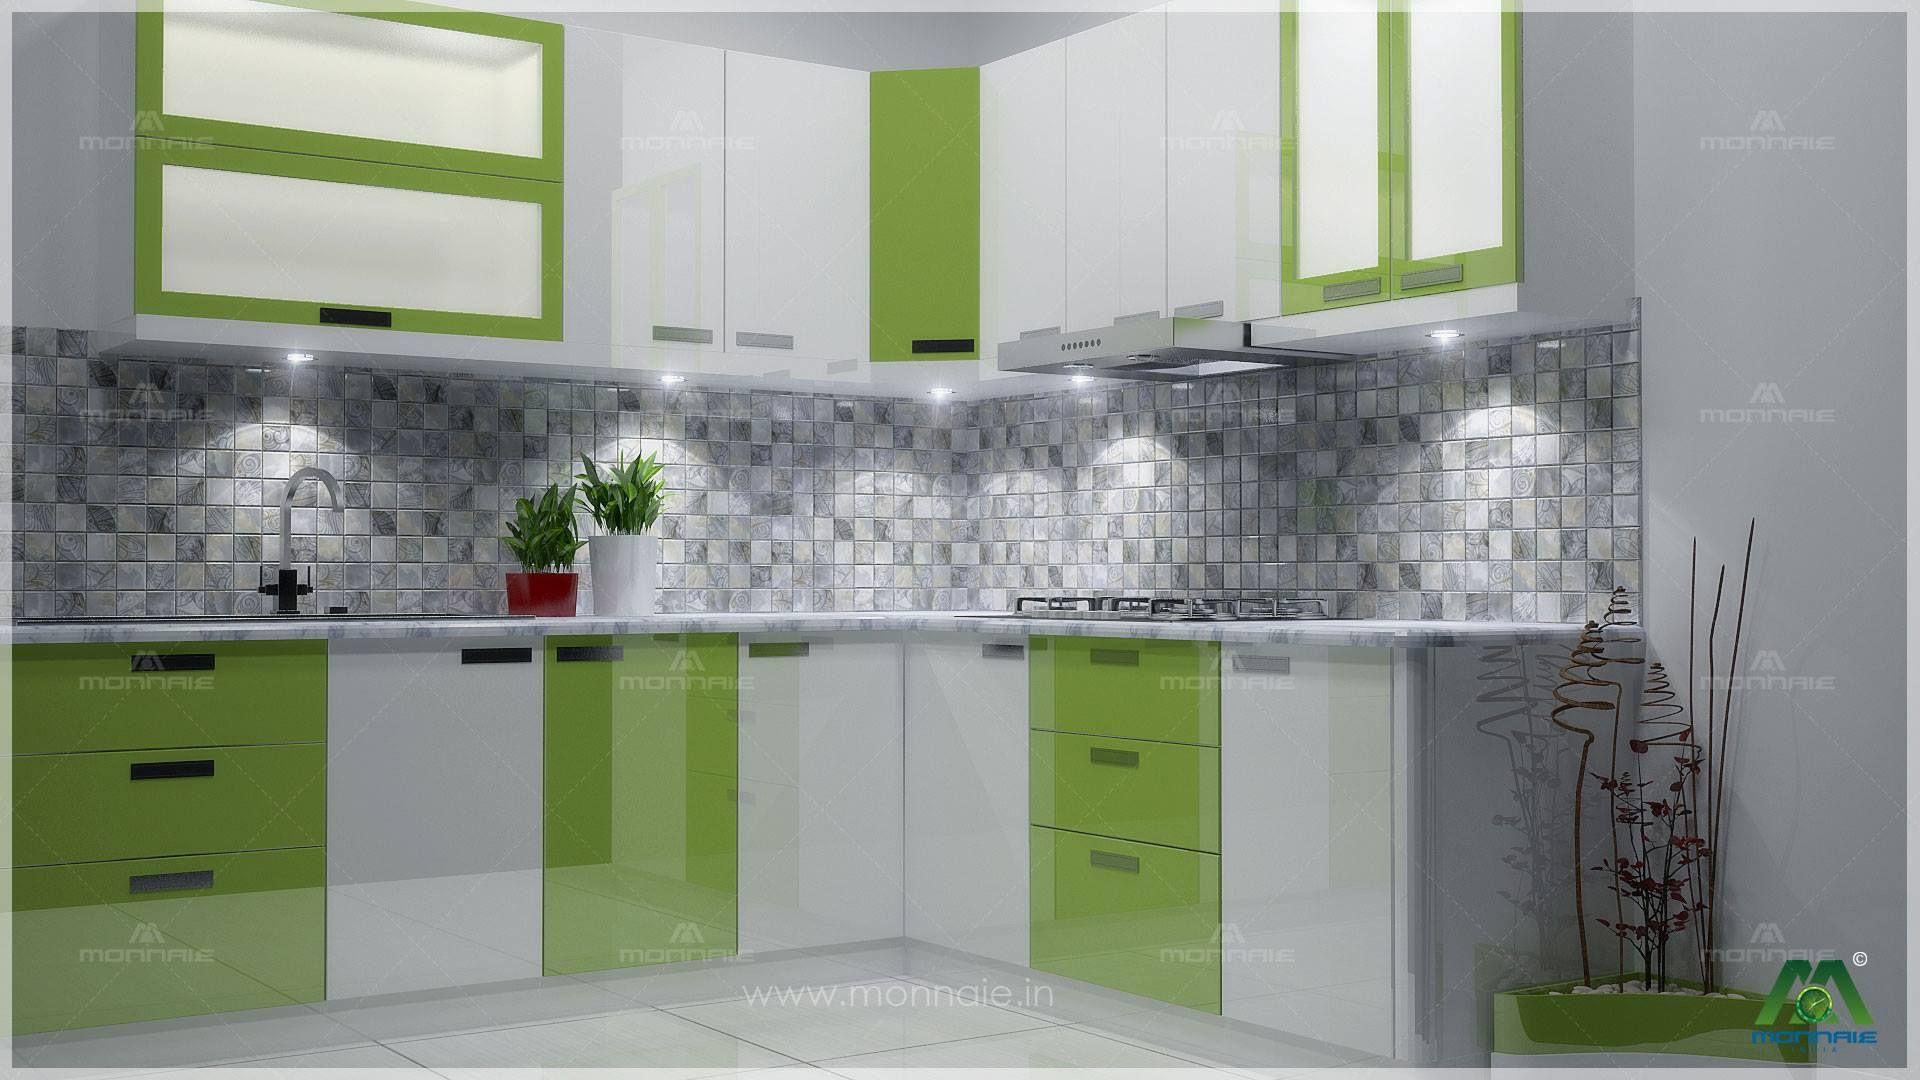 Standard Modular Kitchens Interior Design By Monnaie Architects Urbanclaphomes Urbanclap Interior Design Kitchen L Shaped Modular Kitchen Green Kitchen Paint